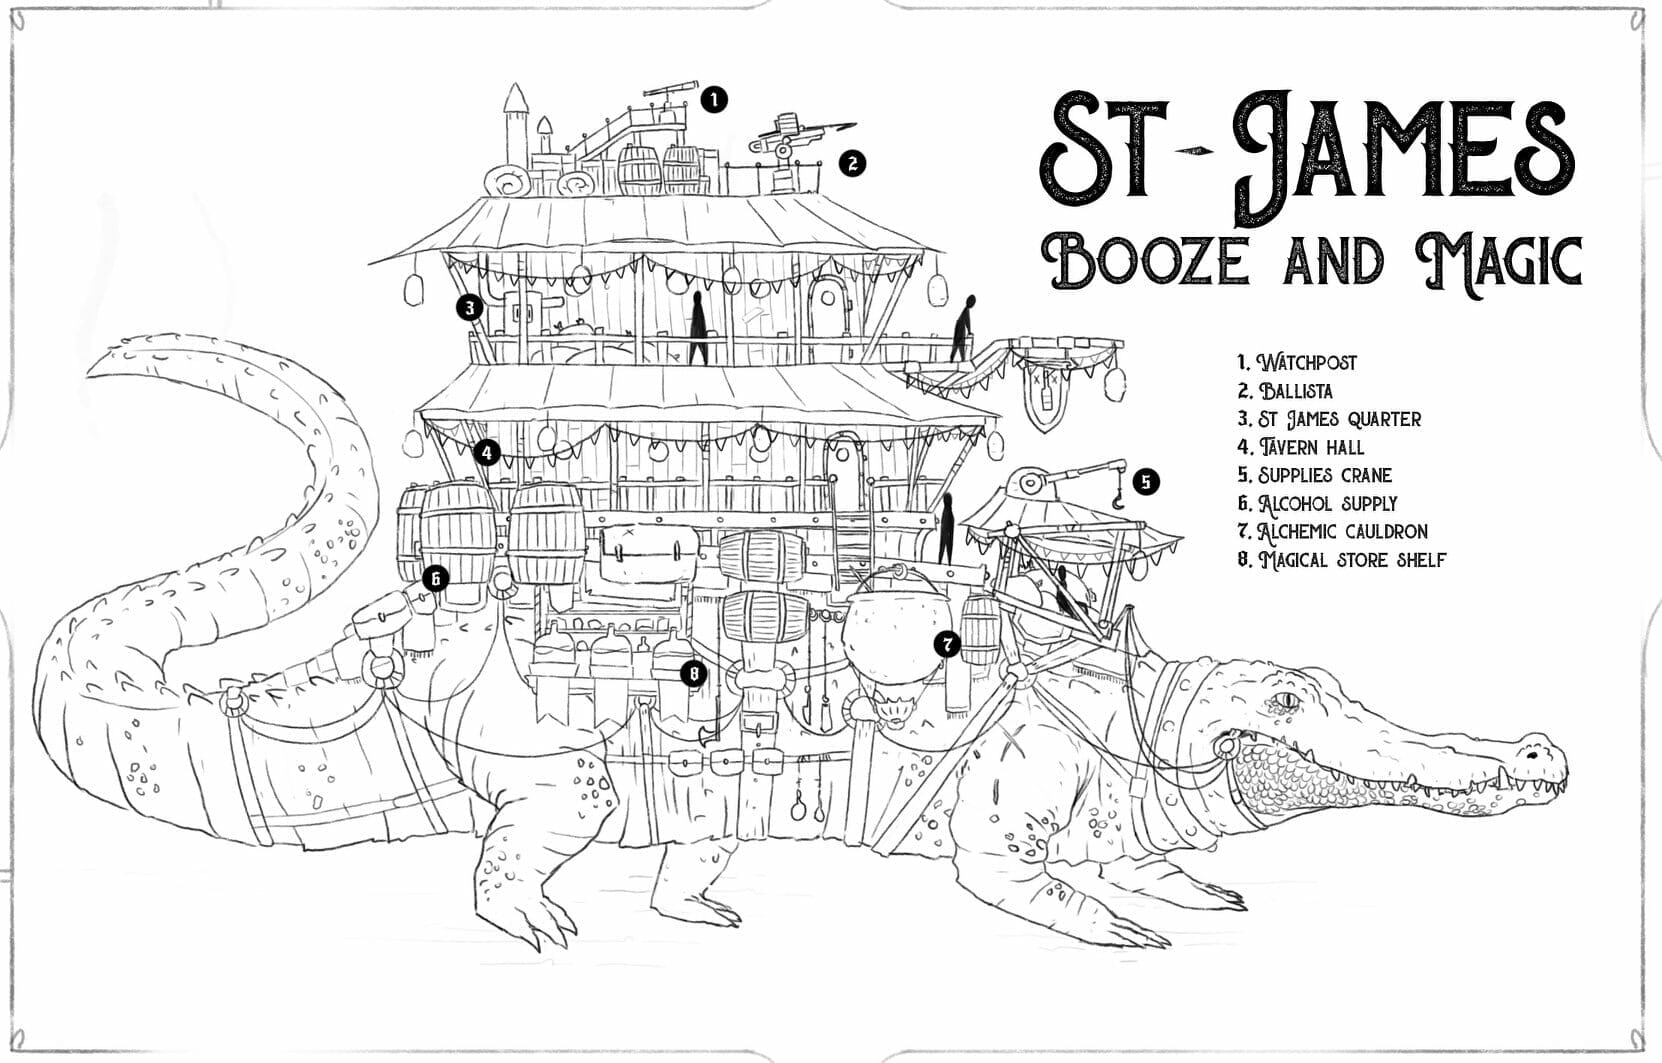 St James Booze and Magic